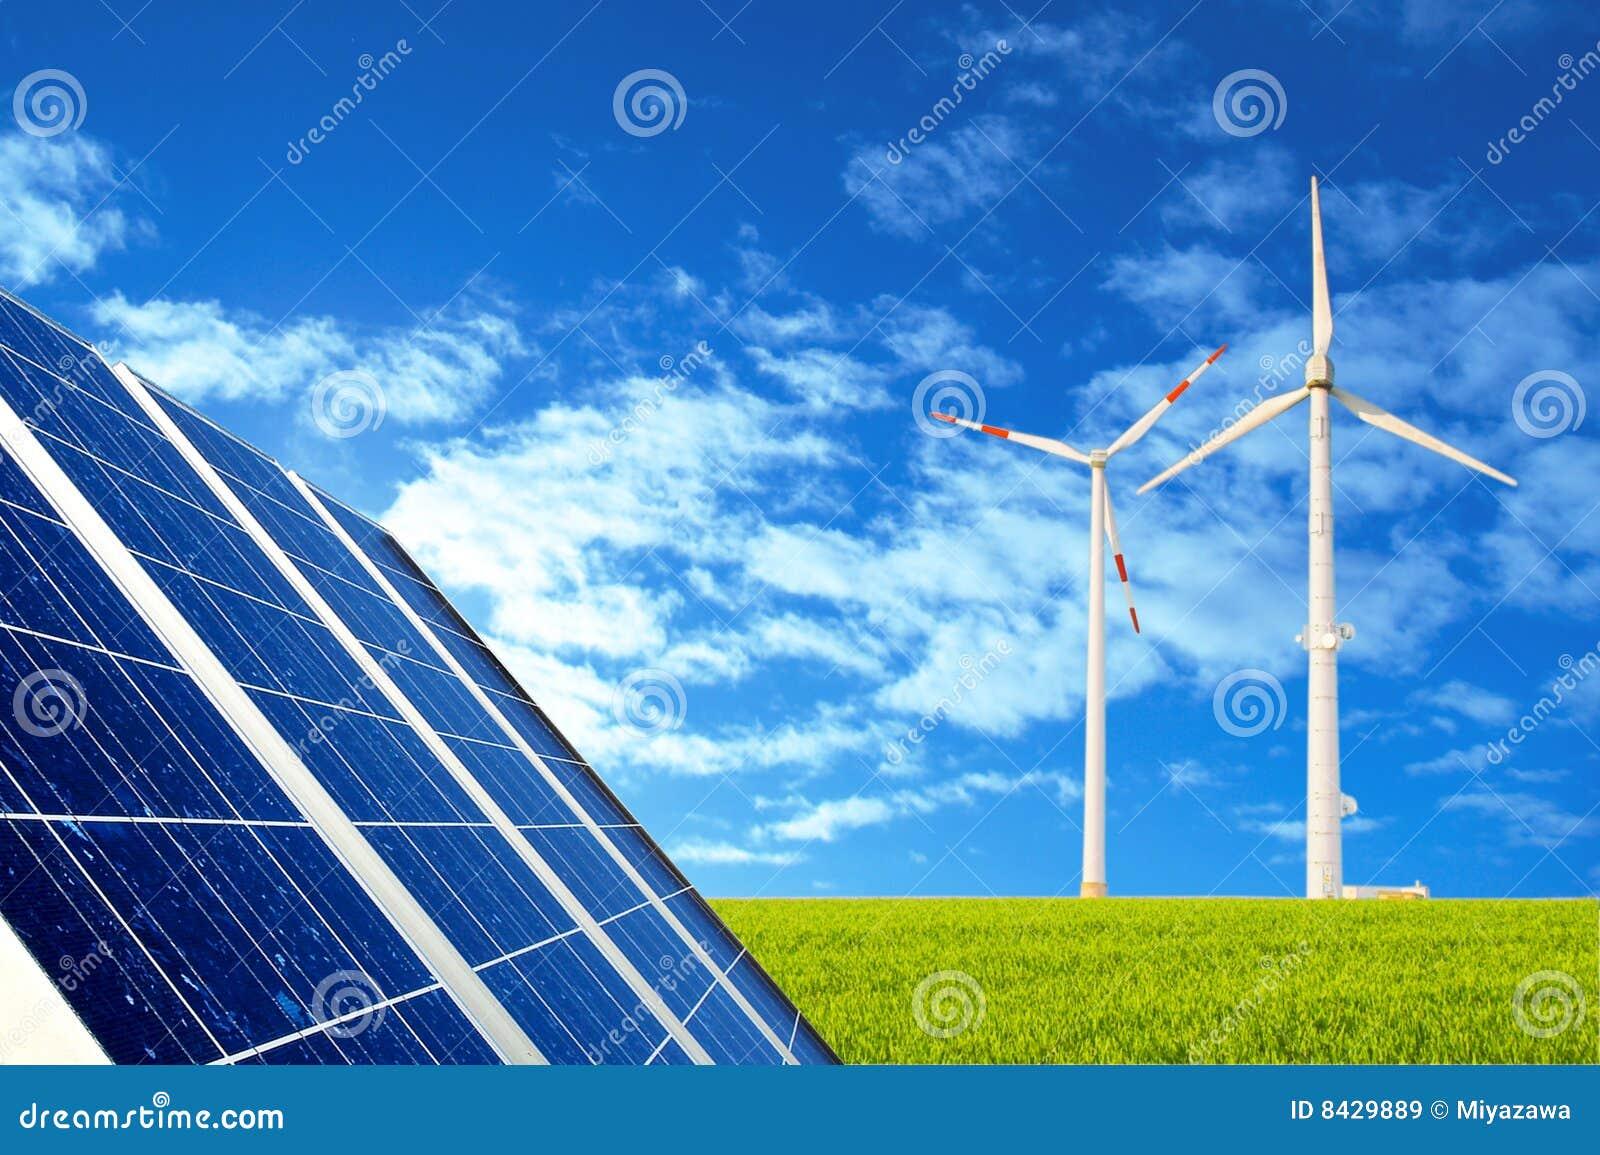 solar-wind-energy-8429889.jpg